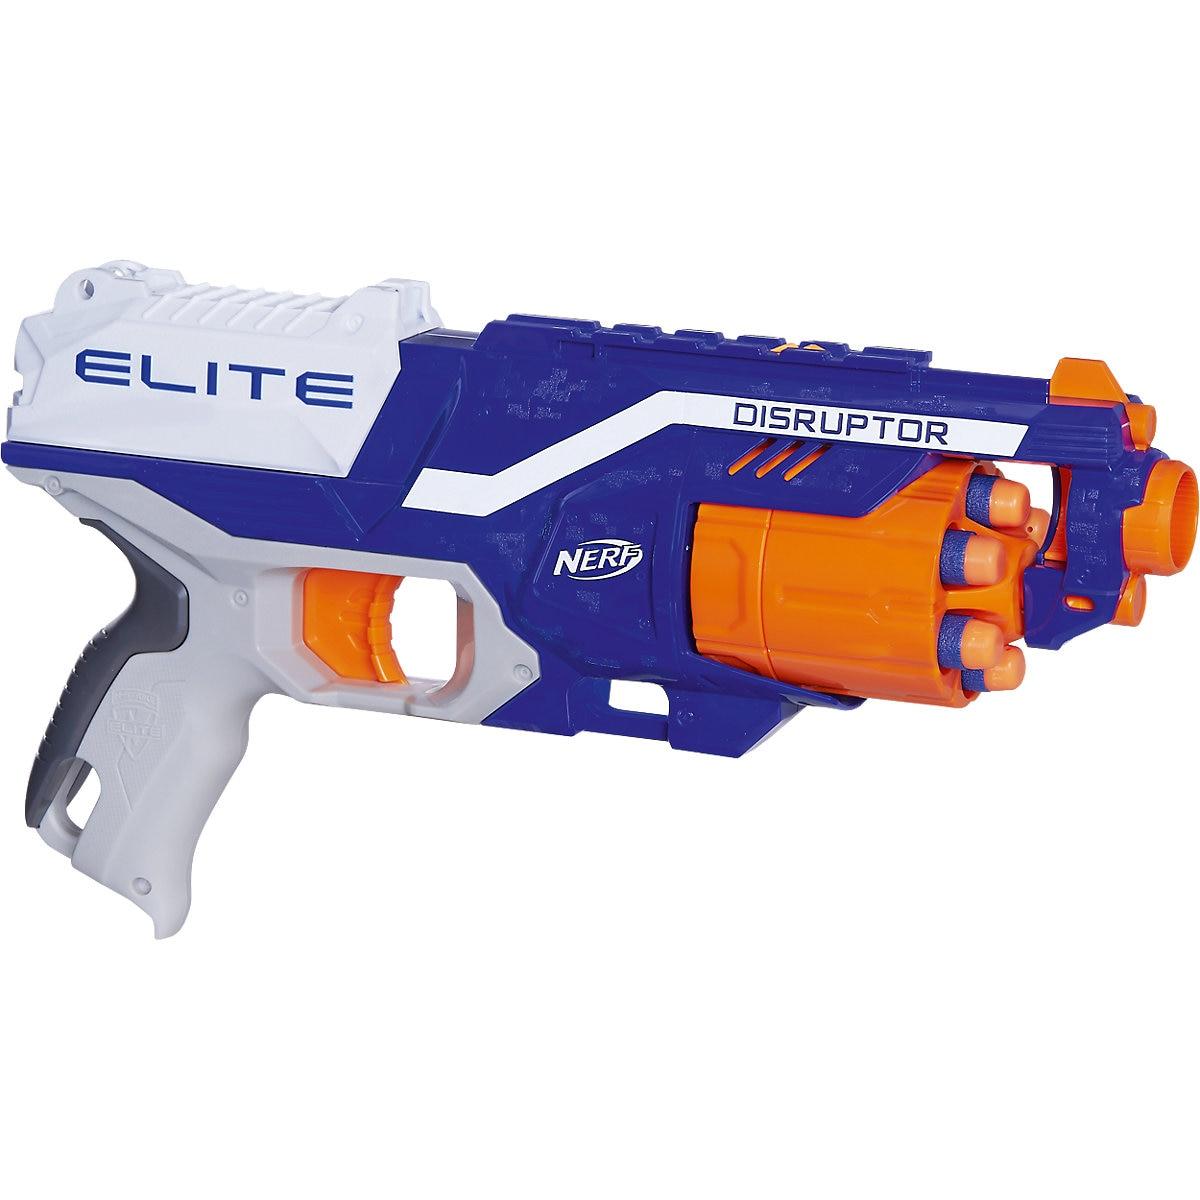 Toy Guns NERF 5104315 Children Kids Toy Gun Weapon Blasters Boys Shooting Games Outdoor Play MTpromo